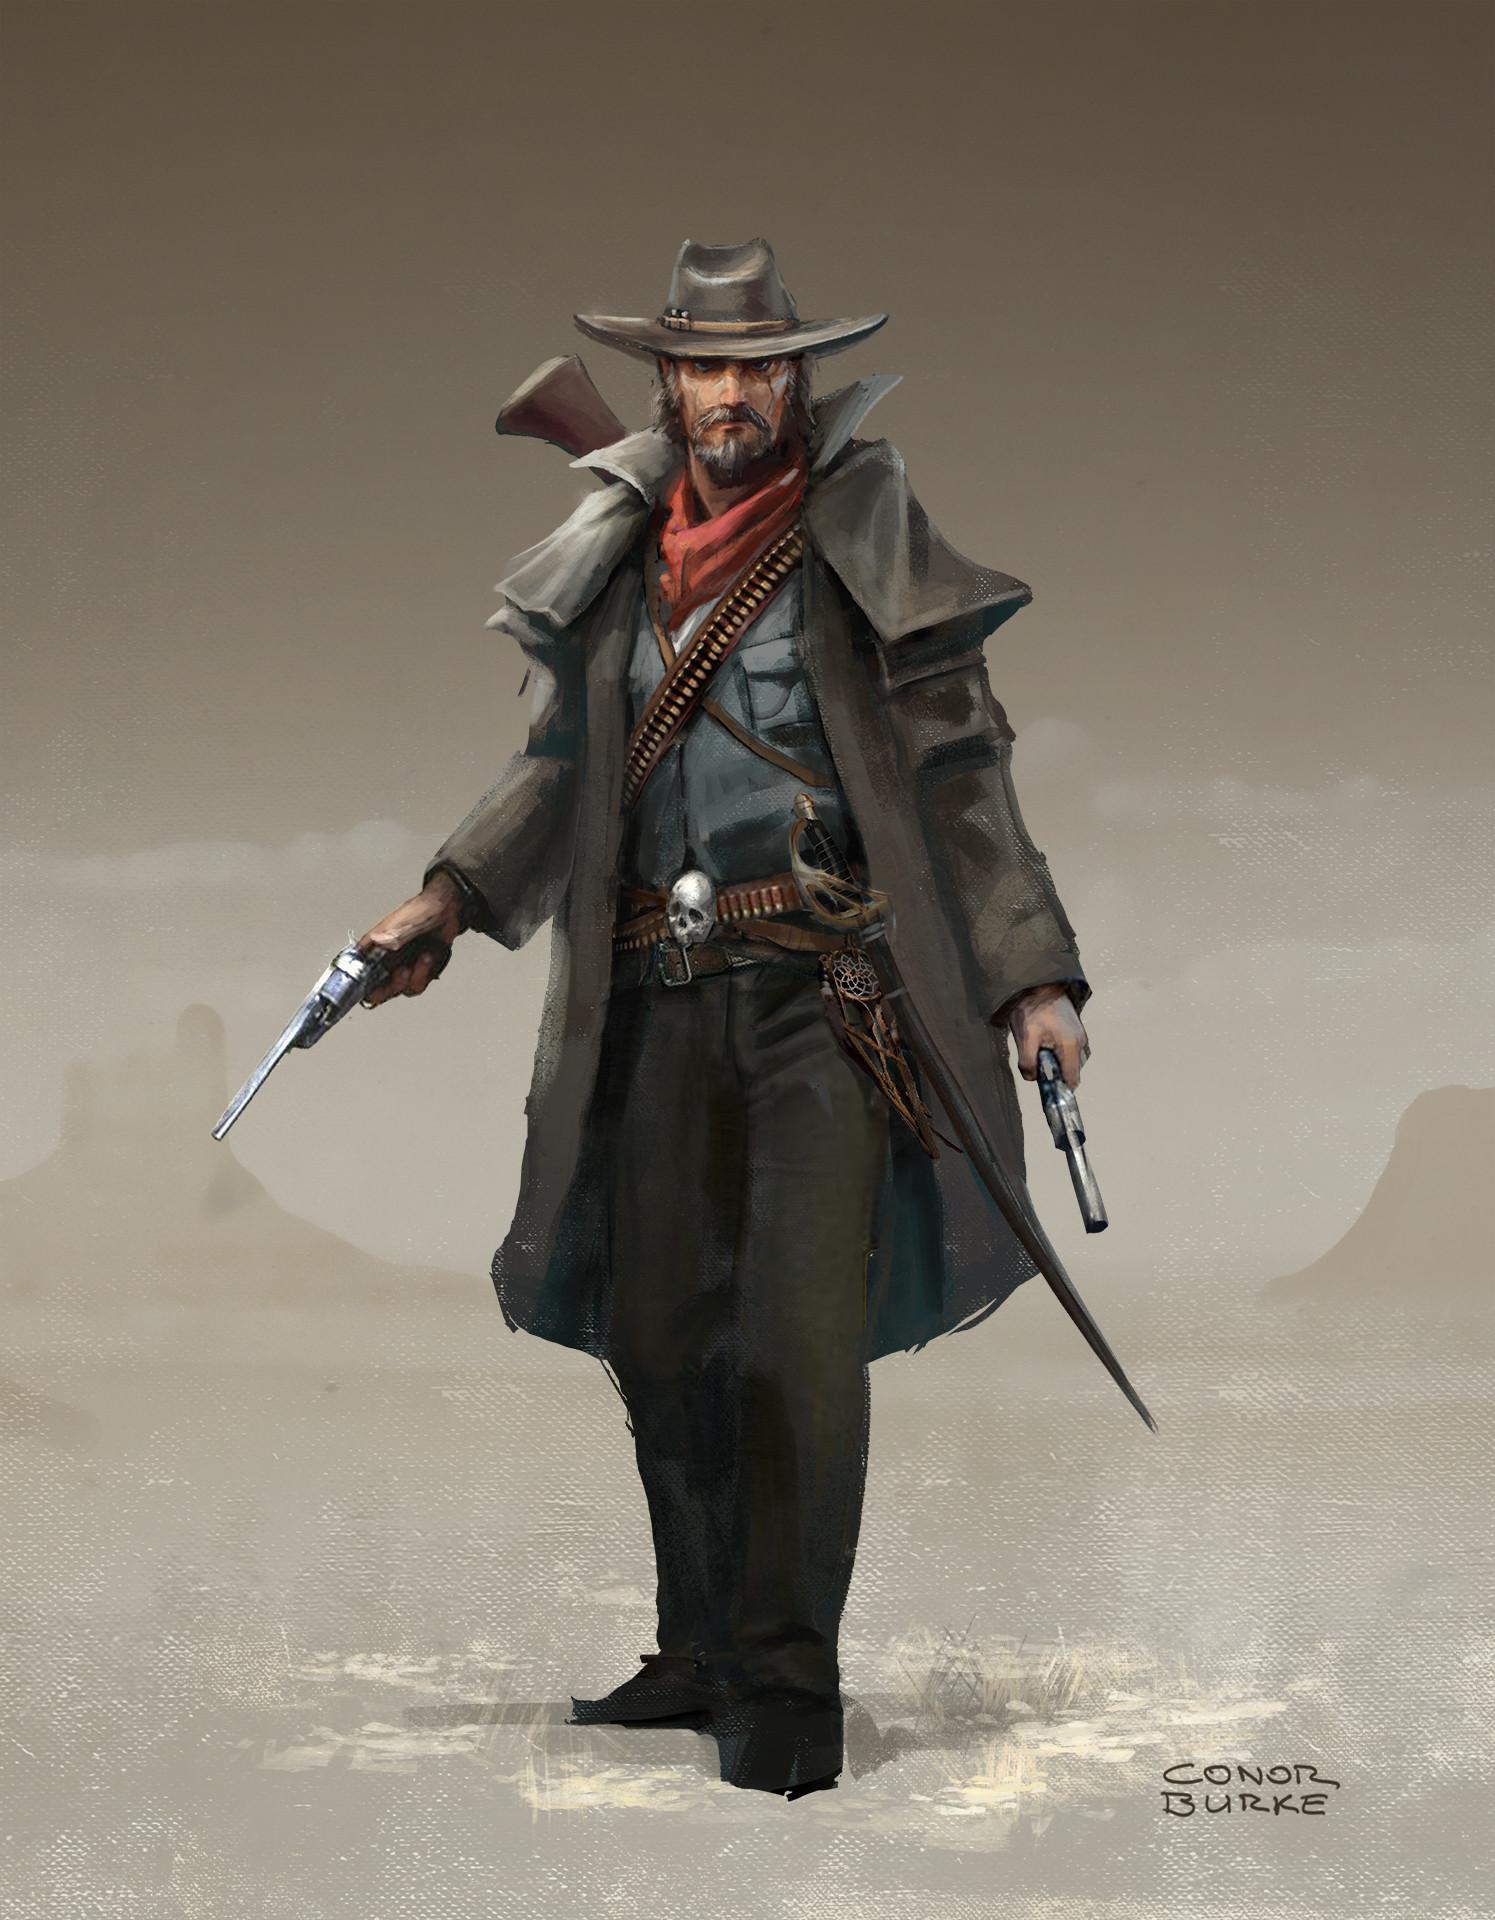 Conor burke conorburke gunslinger